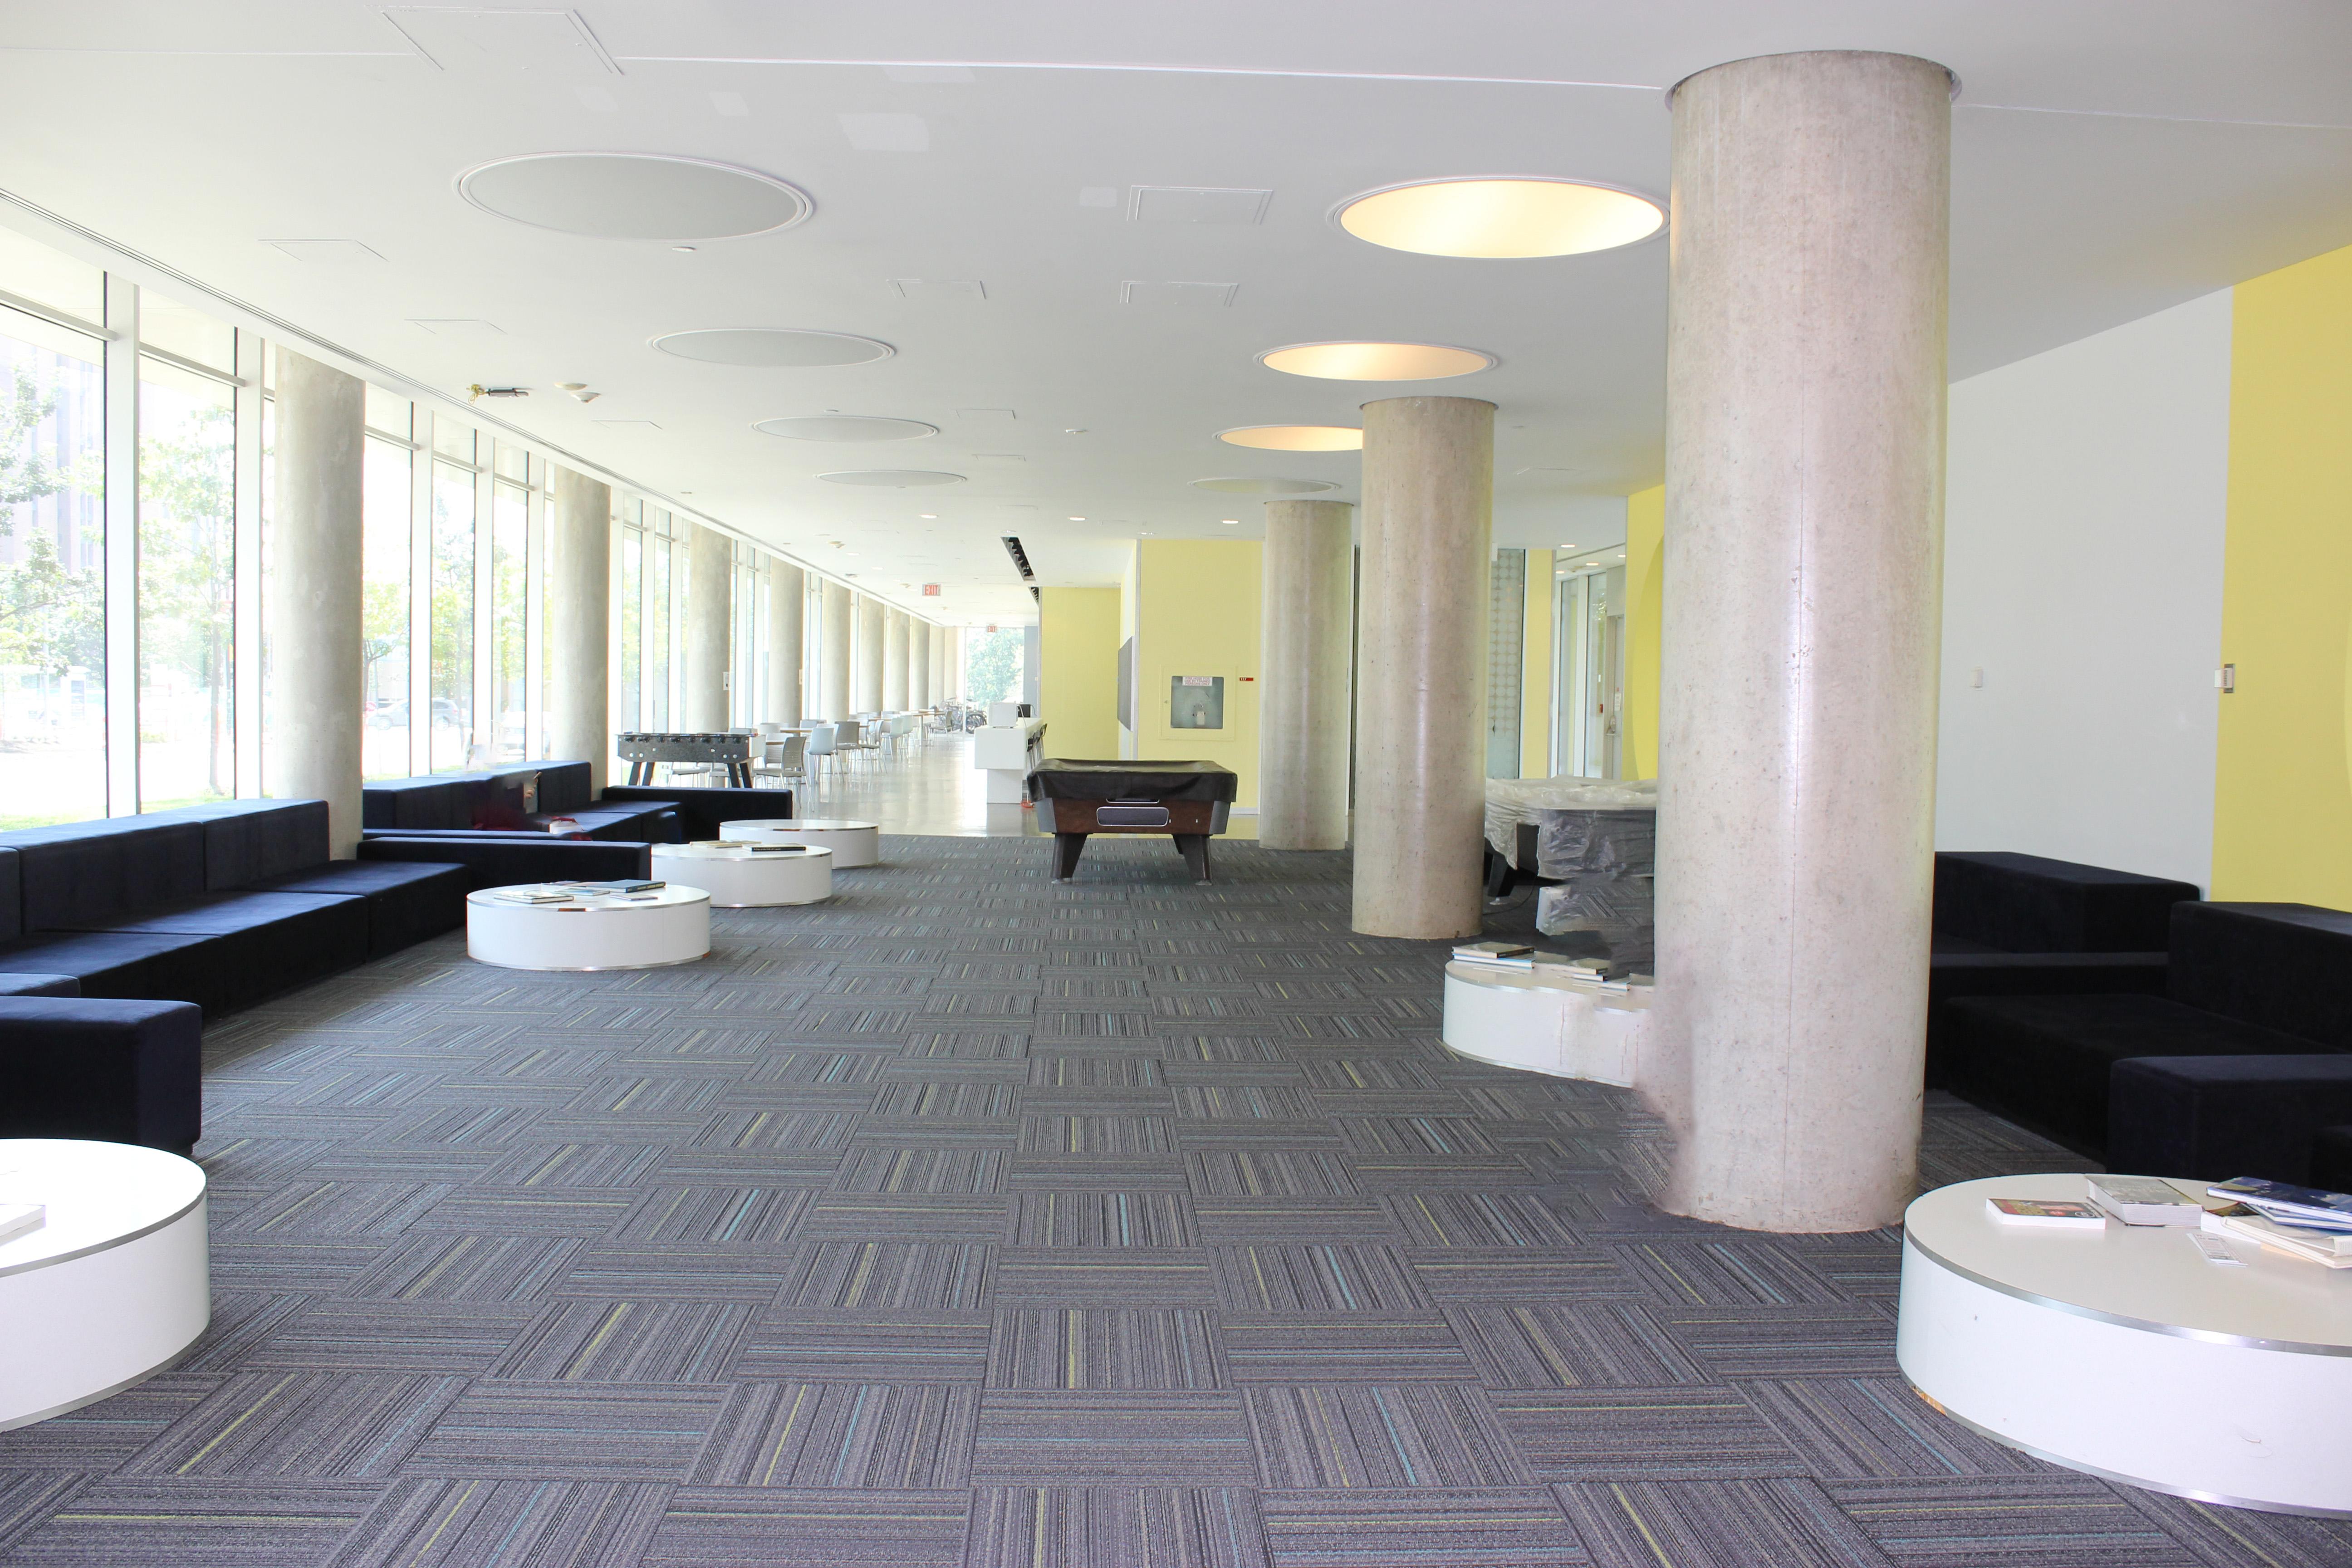 Pond interior, lobby area